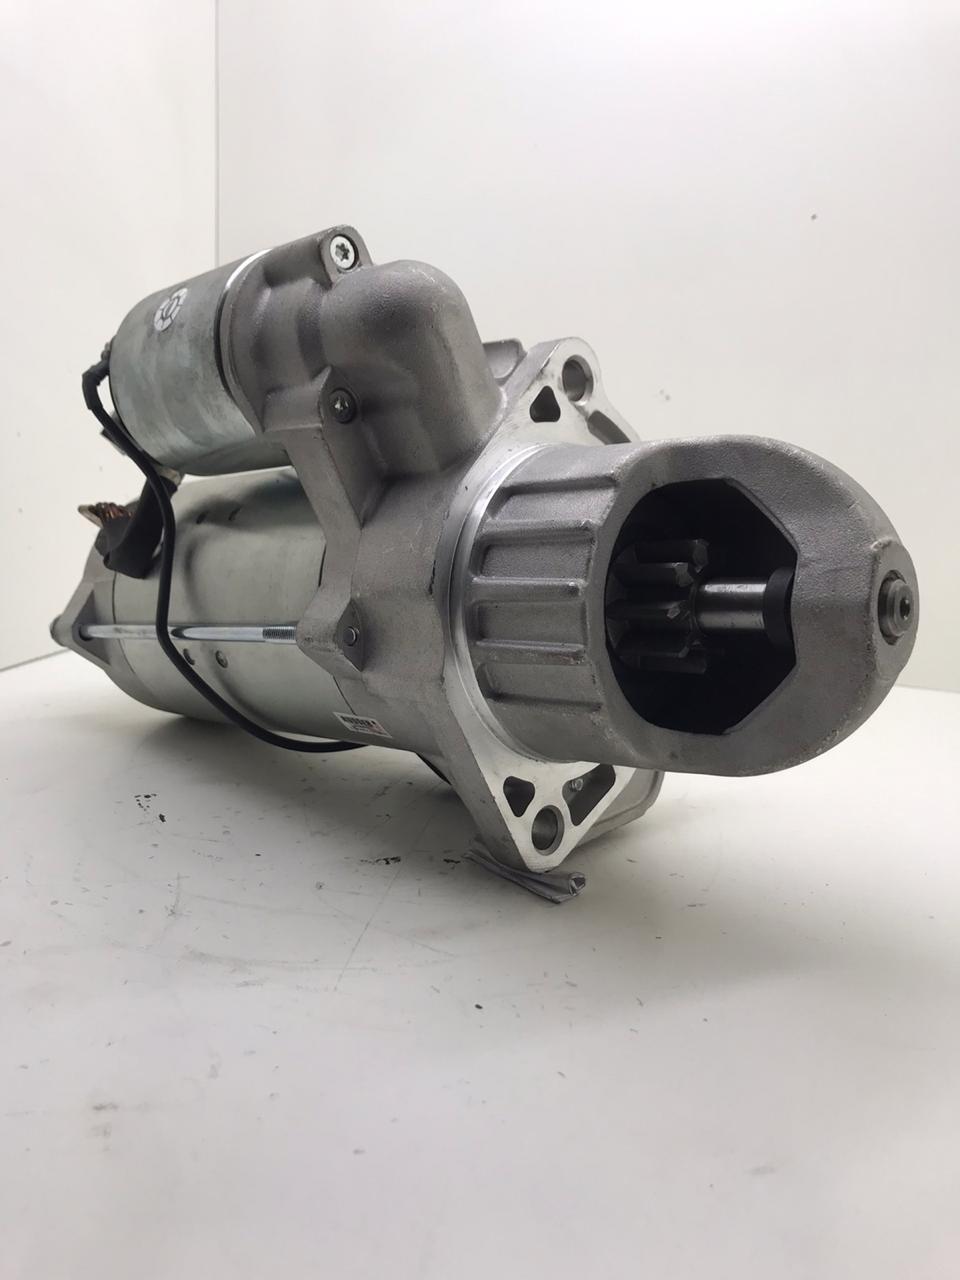 Motor De Arranque MBB SERIE 12T 14T 16T ATEGO AXOR BOSCH 24V 9 DENTES 000231002 0001231033 82000168 36262016003 0041518401 0051512001 80 130 04 E 20602 D 20192 AEC14062